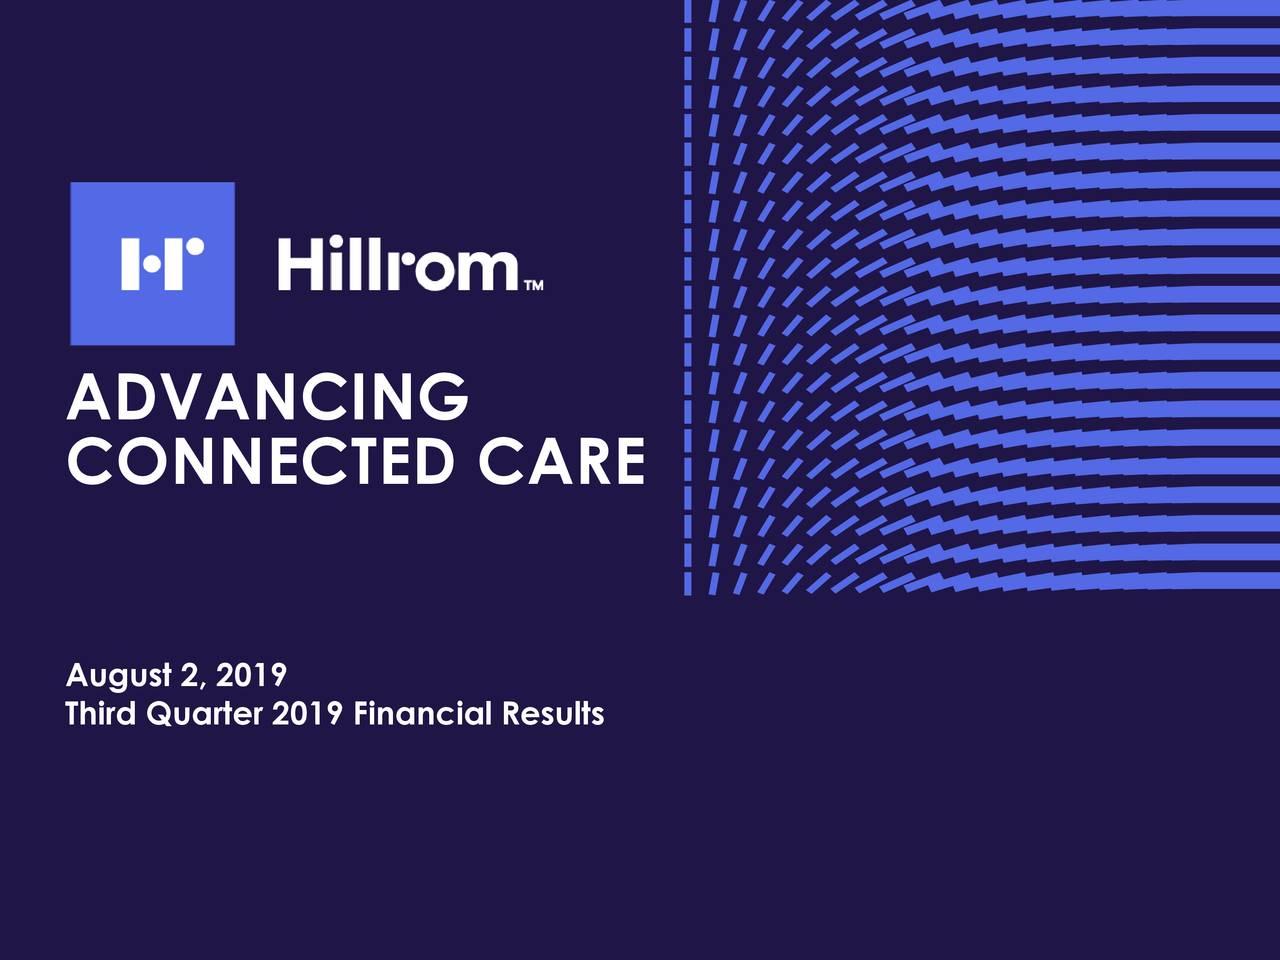 Earnings Disclaimer >> Hill-Rom Holdings, Inc. 2019 Q3 - Results - Earnings Call Slides - Hill-Rom Holdings, Inc. (NYSE ...